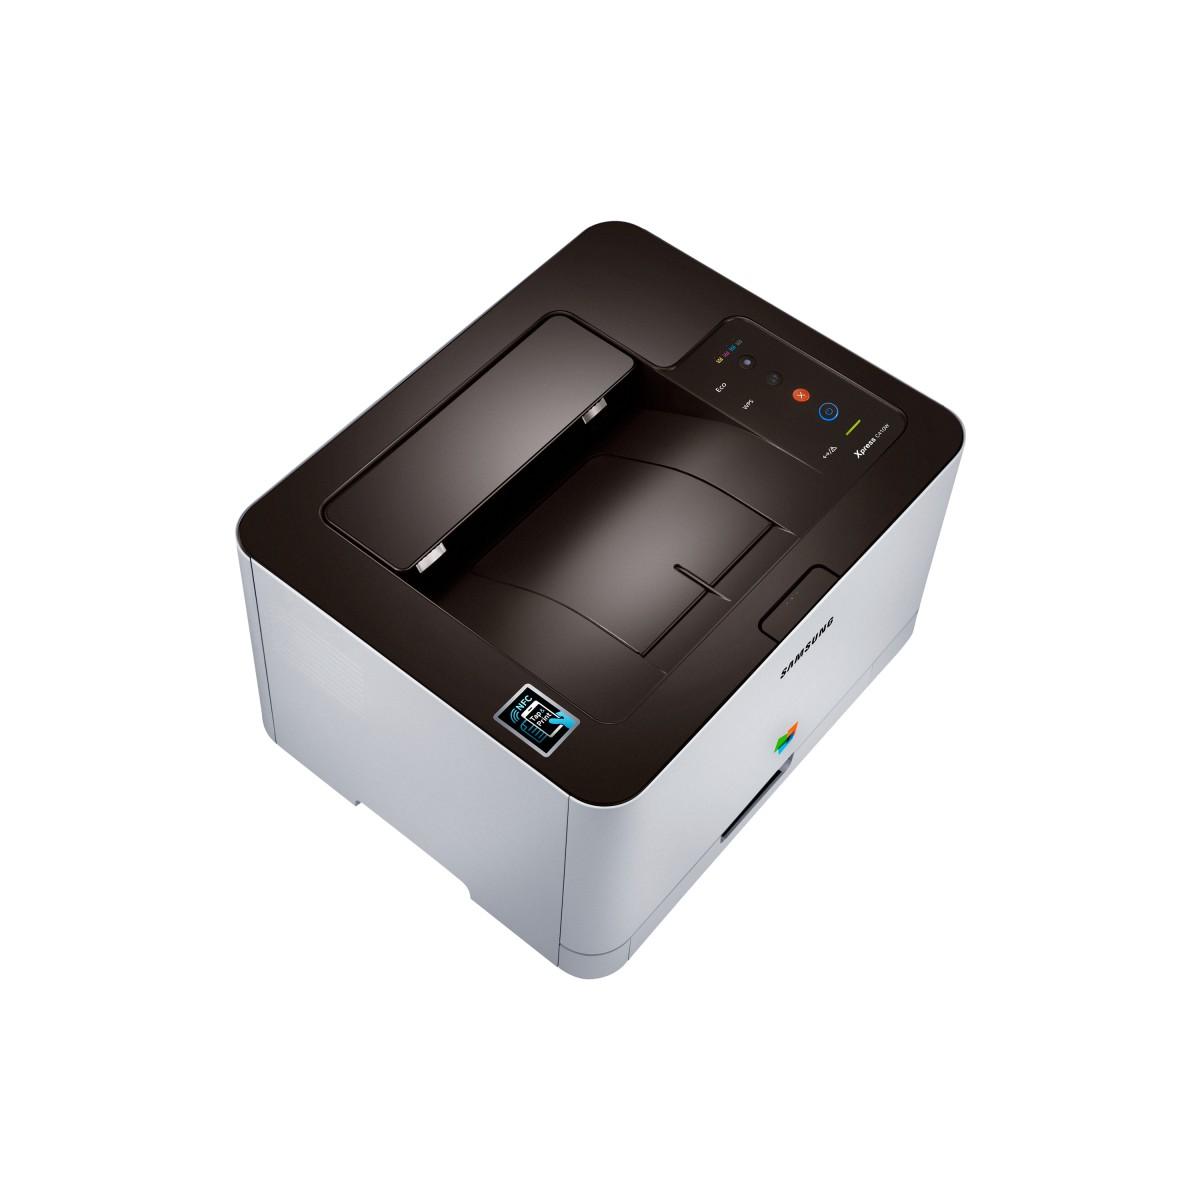 Impressora Samsung Xpress SL-C410W Laser Colorida  - ShopNoroeste.com.br